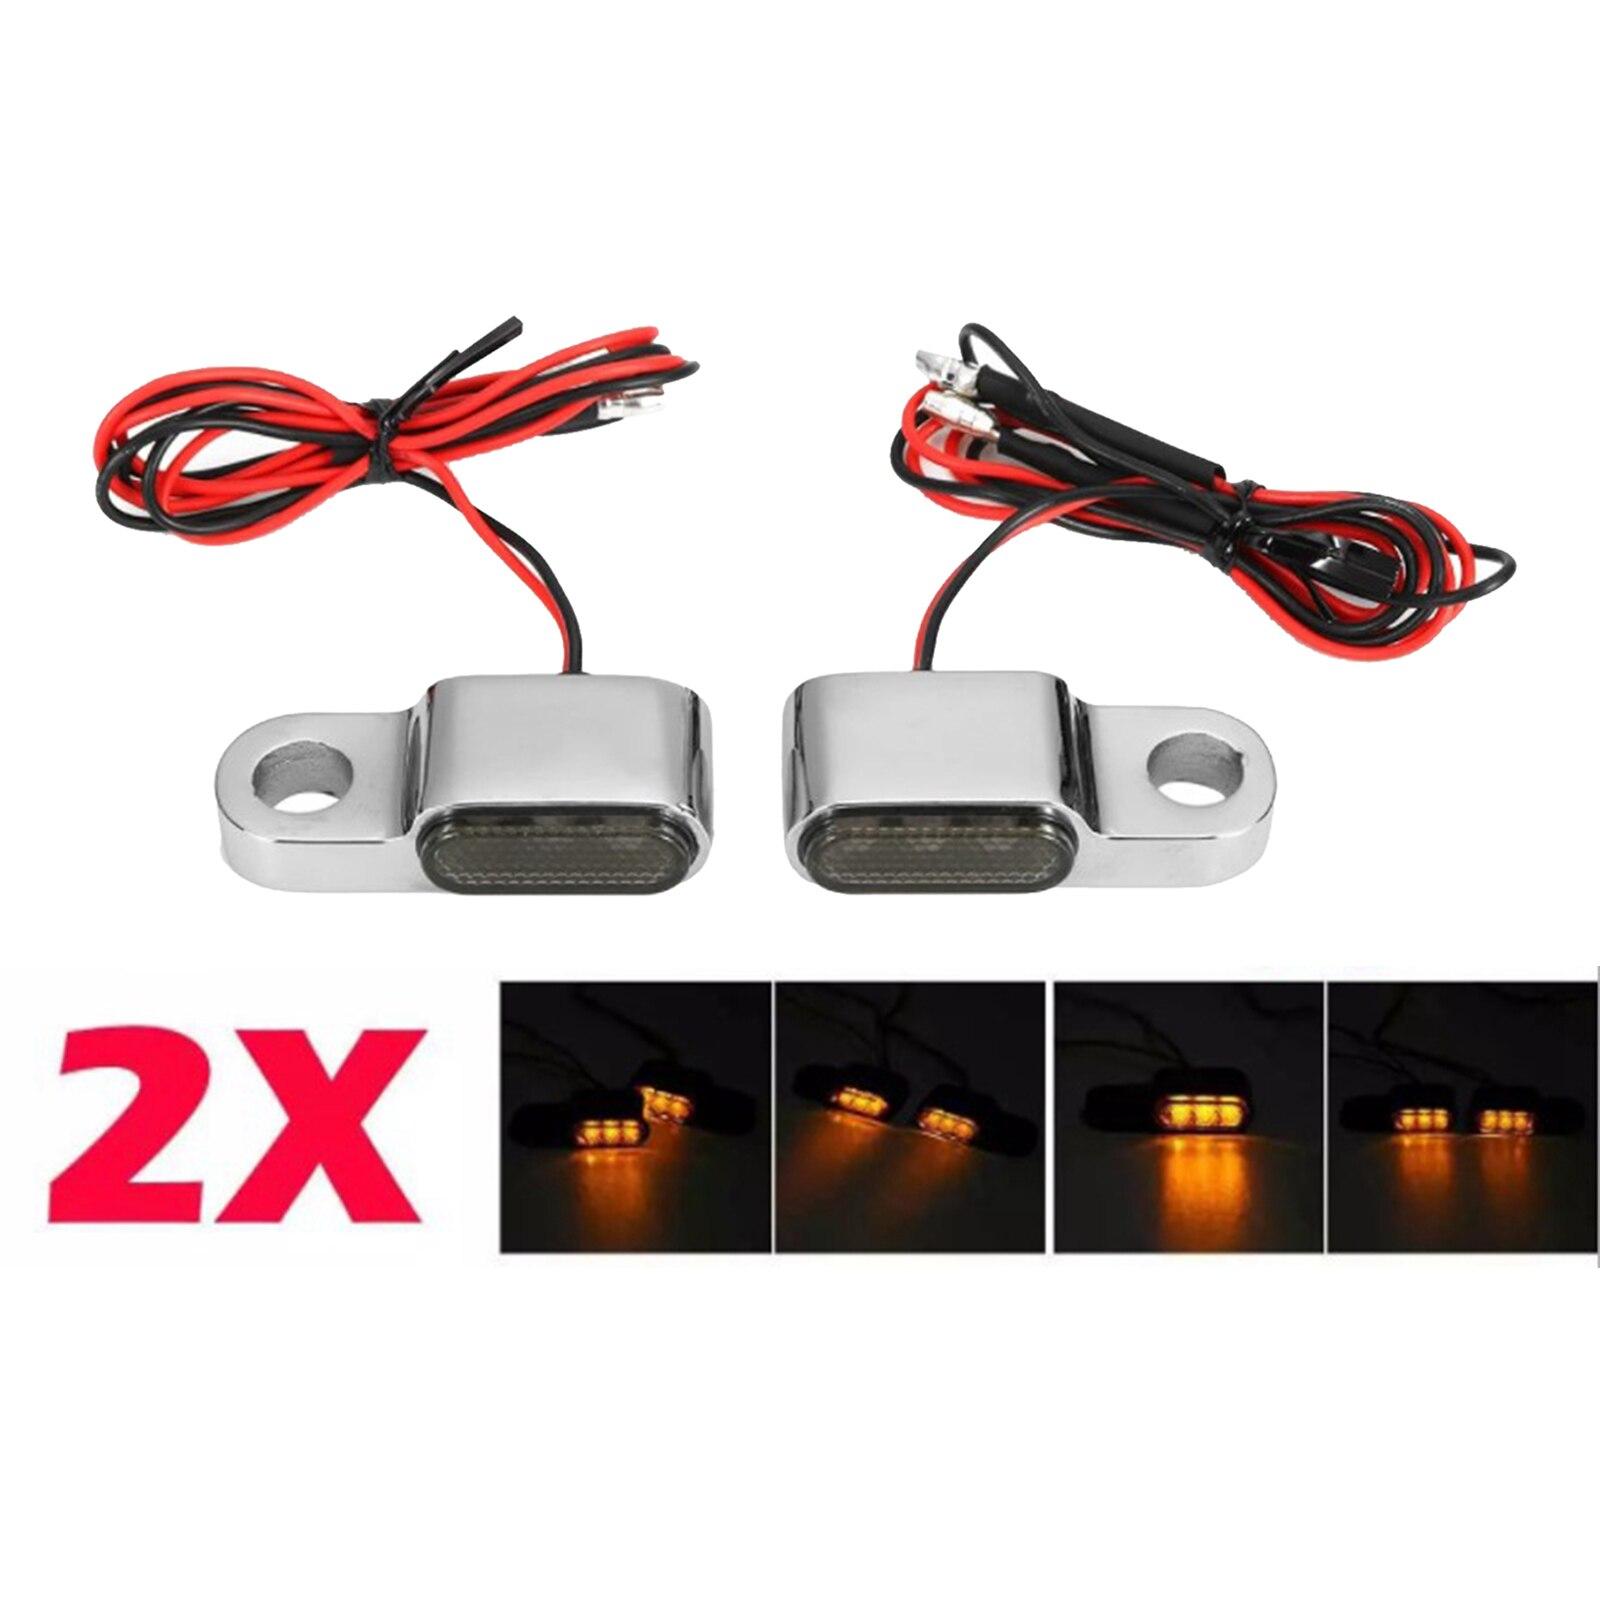 2pack Motorbike LED Turn Signal Indicator 3 LEDs Amber Lamp For Cruiser ATV